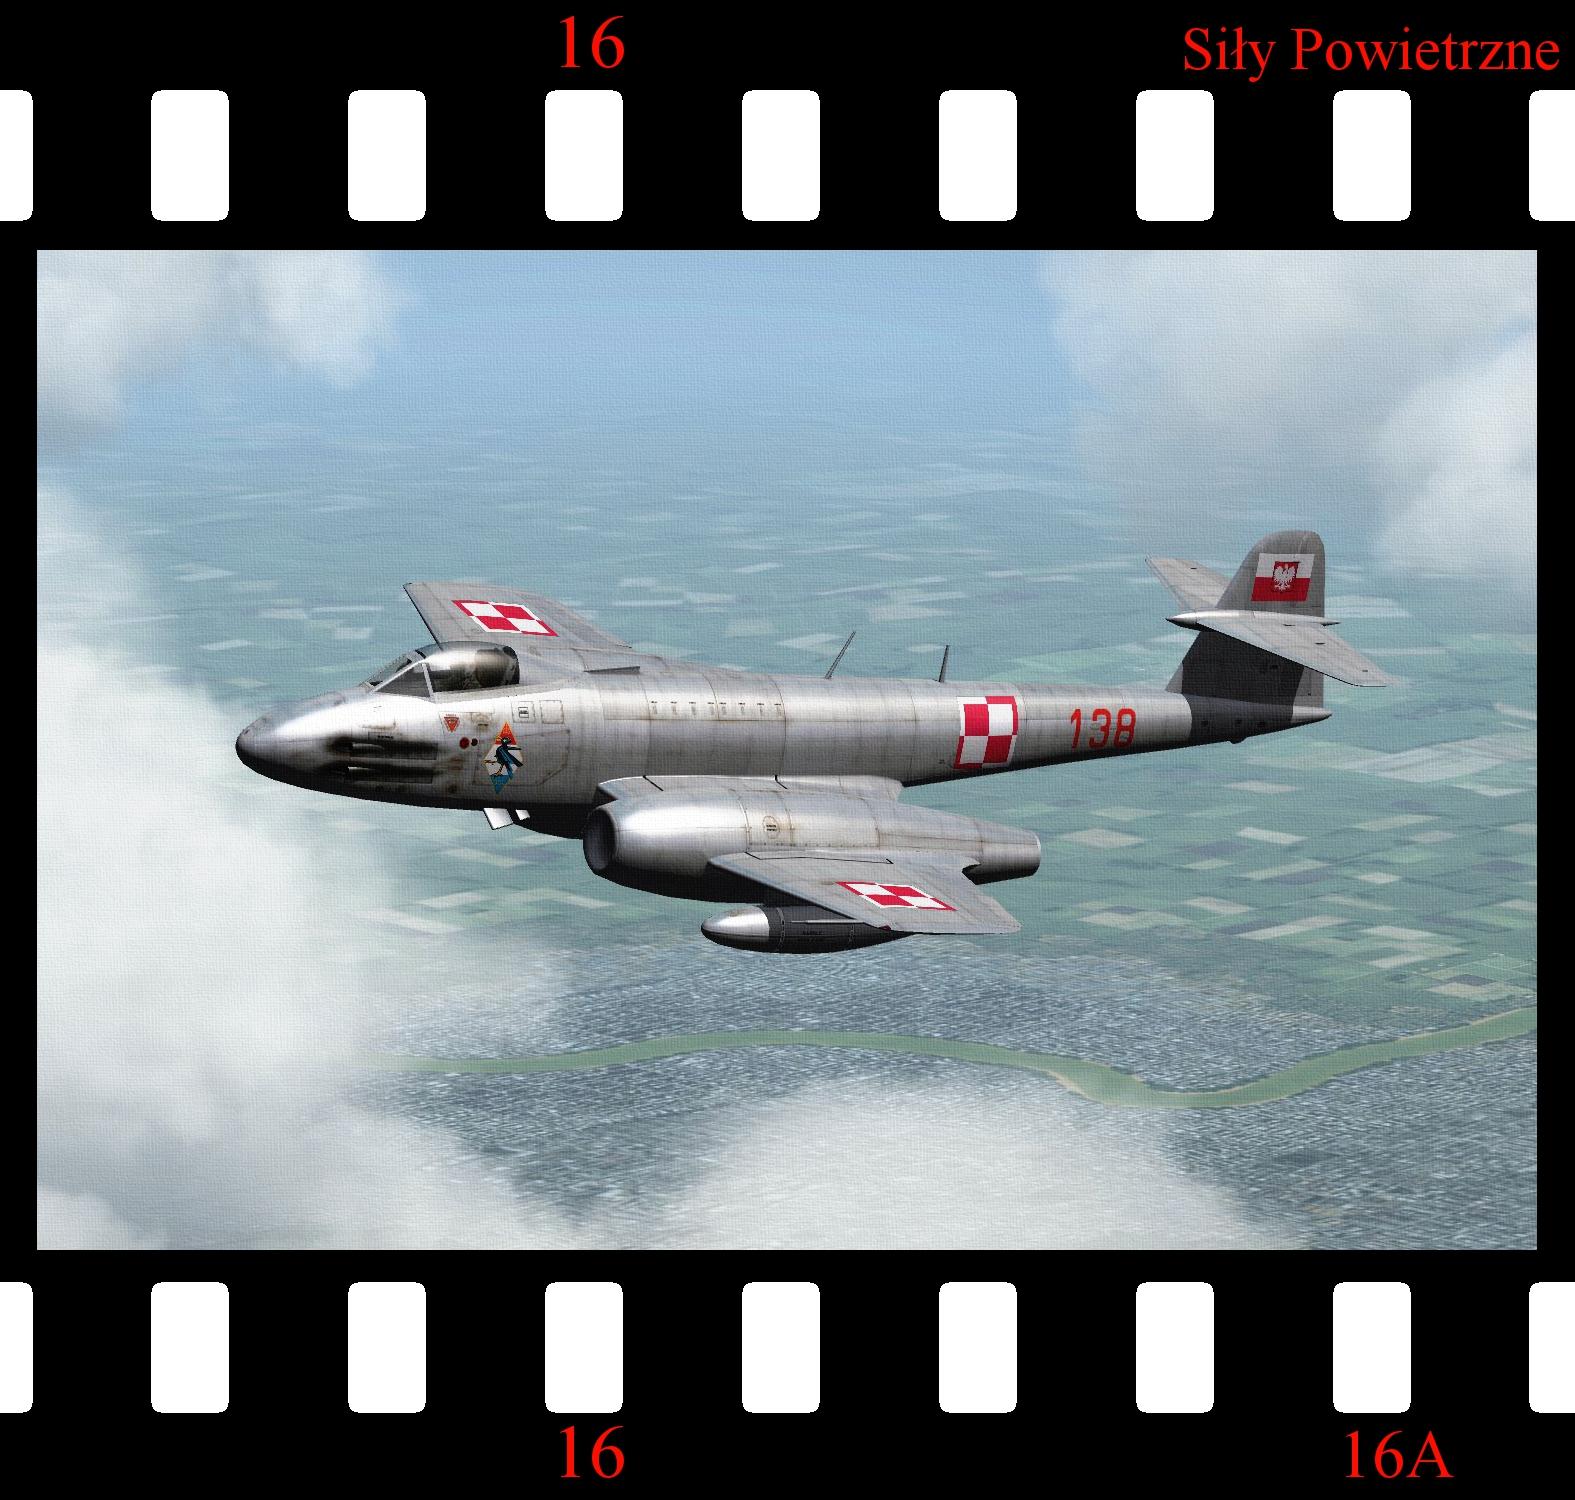 [Fictional] PZL-60 (Polish Gloster Meteor F.8)